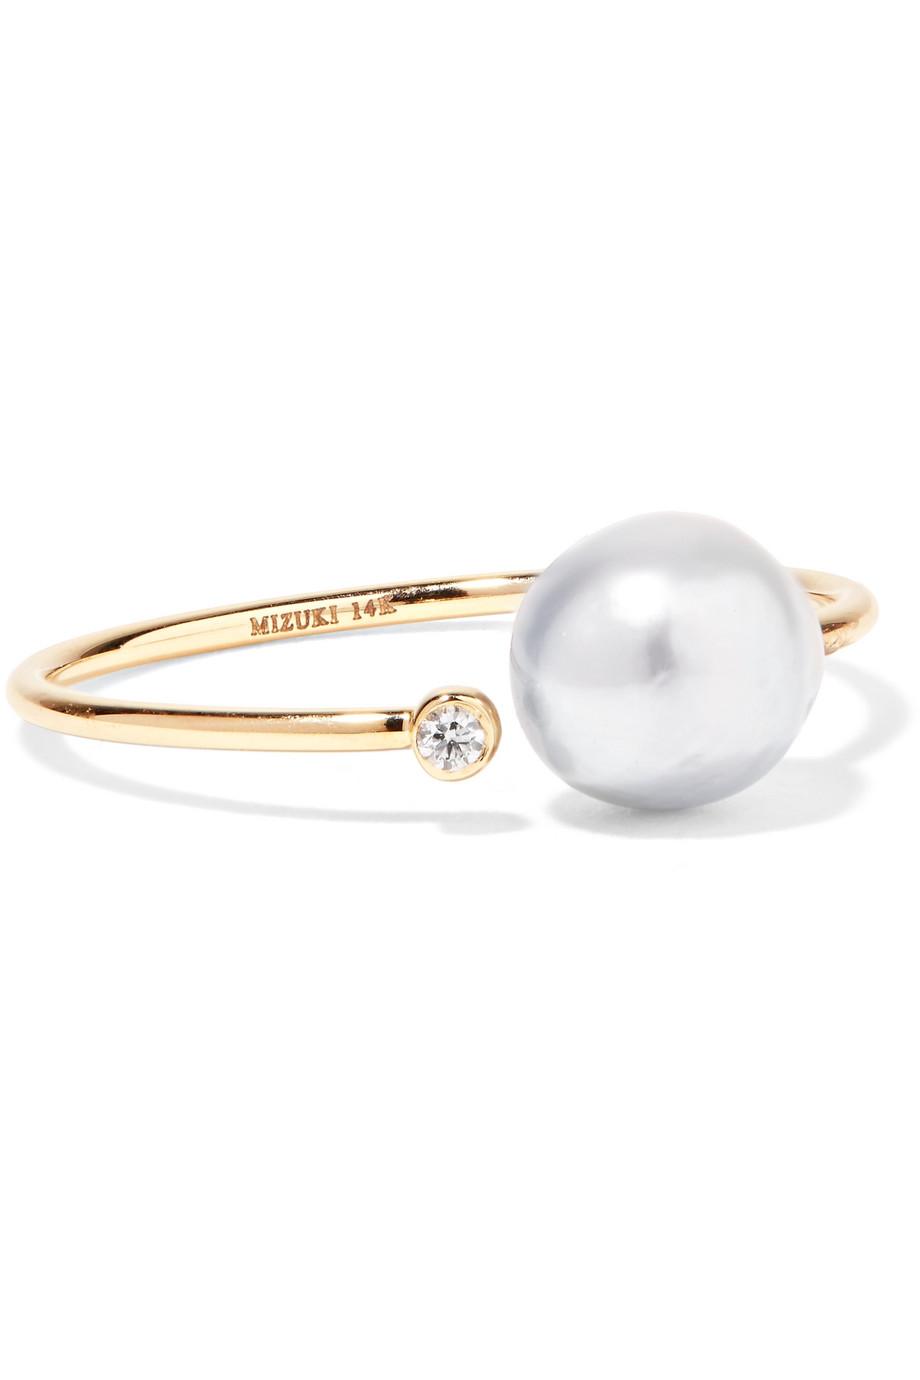 Pearl Wedding Rings.14 Karat Gold Diamond And Pearl Ring